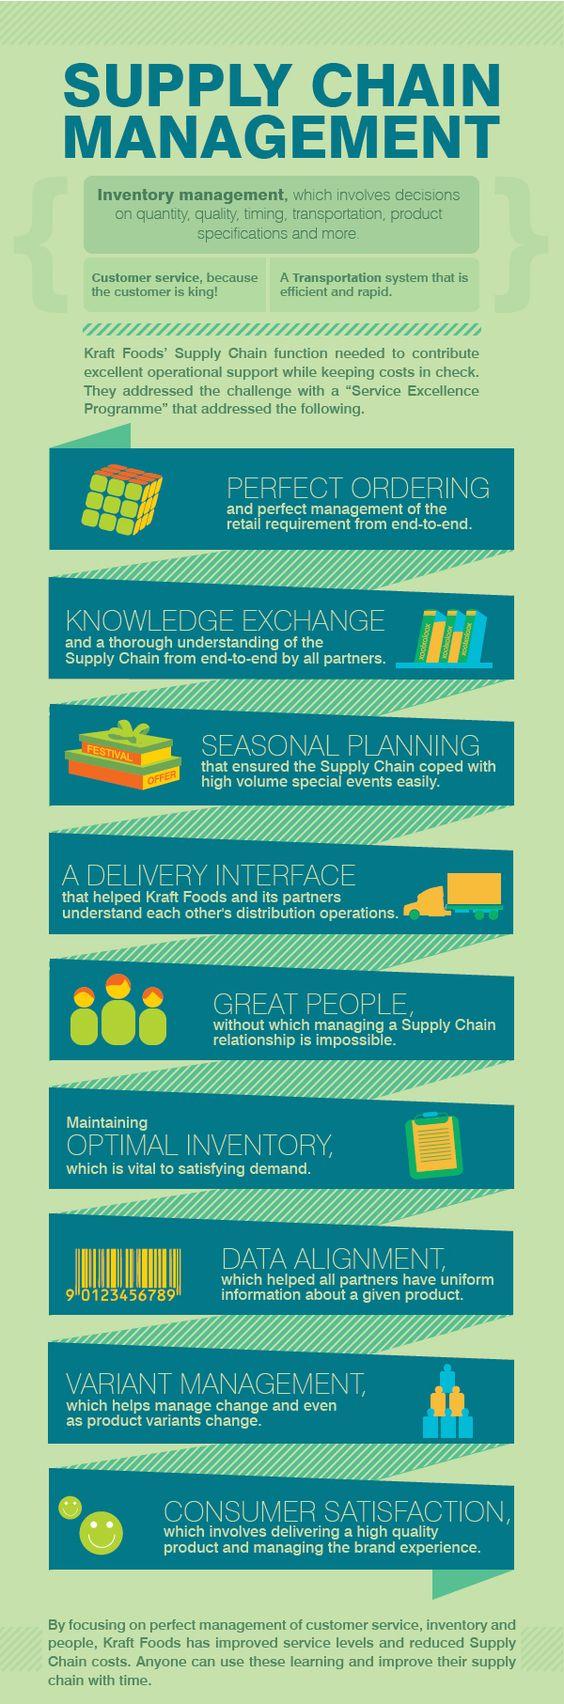 Visit http://www.acalia.org/ #procurement #projectmanagement #supplychainmanagement